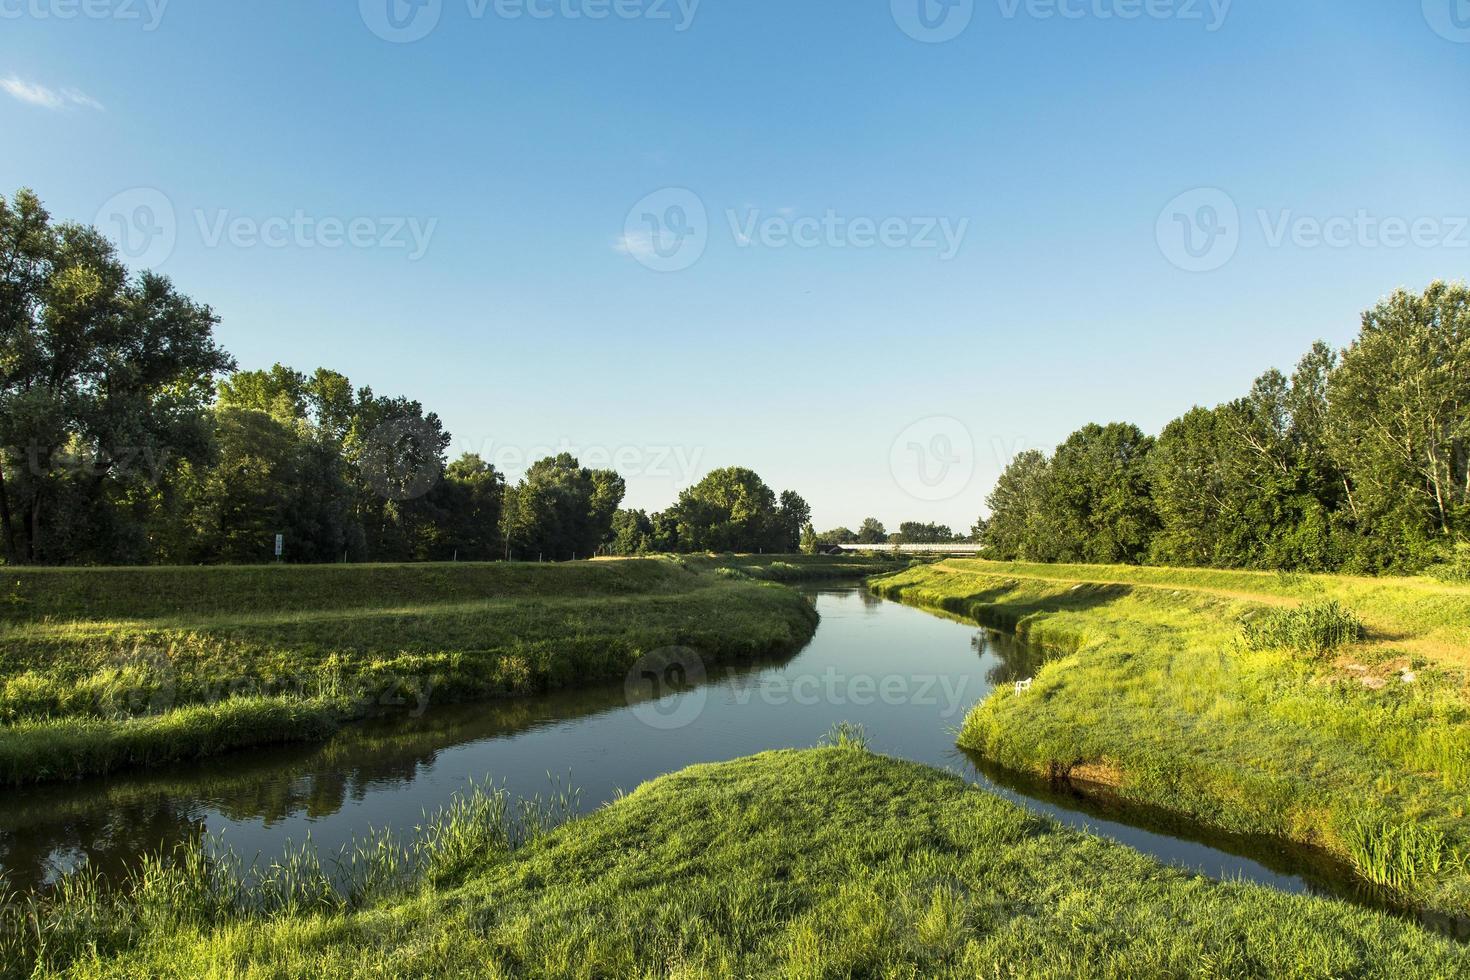 Oasi's river photo